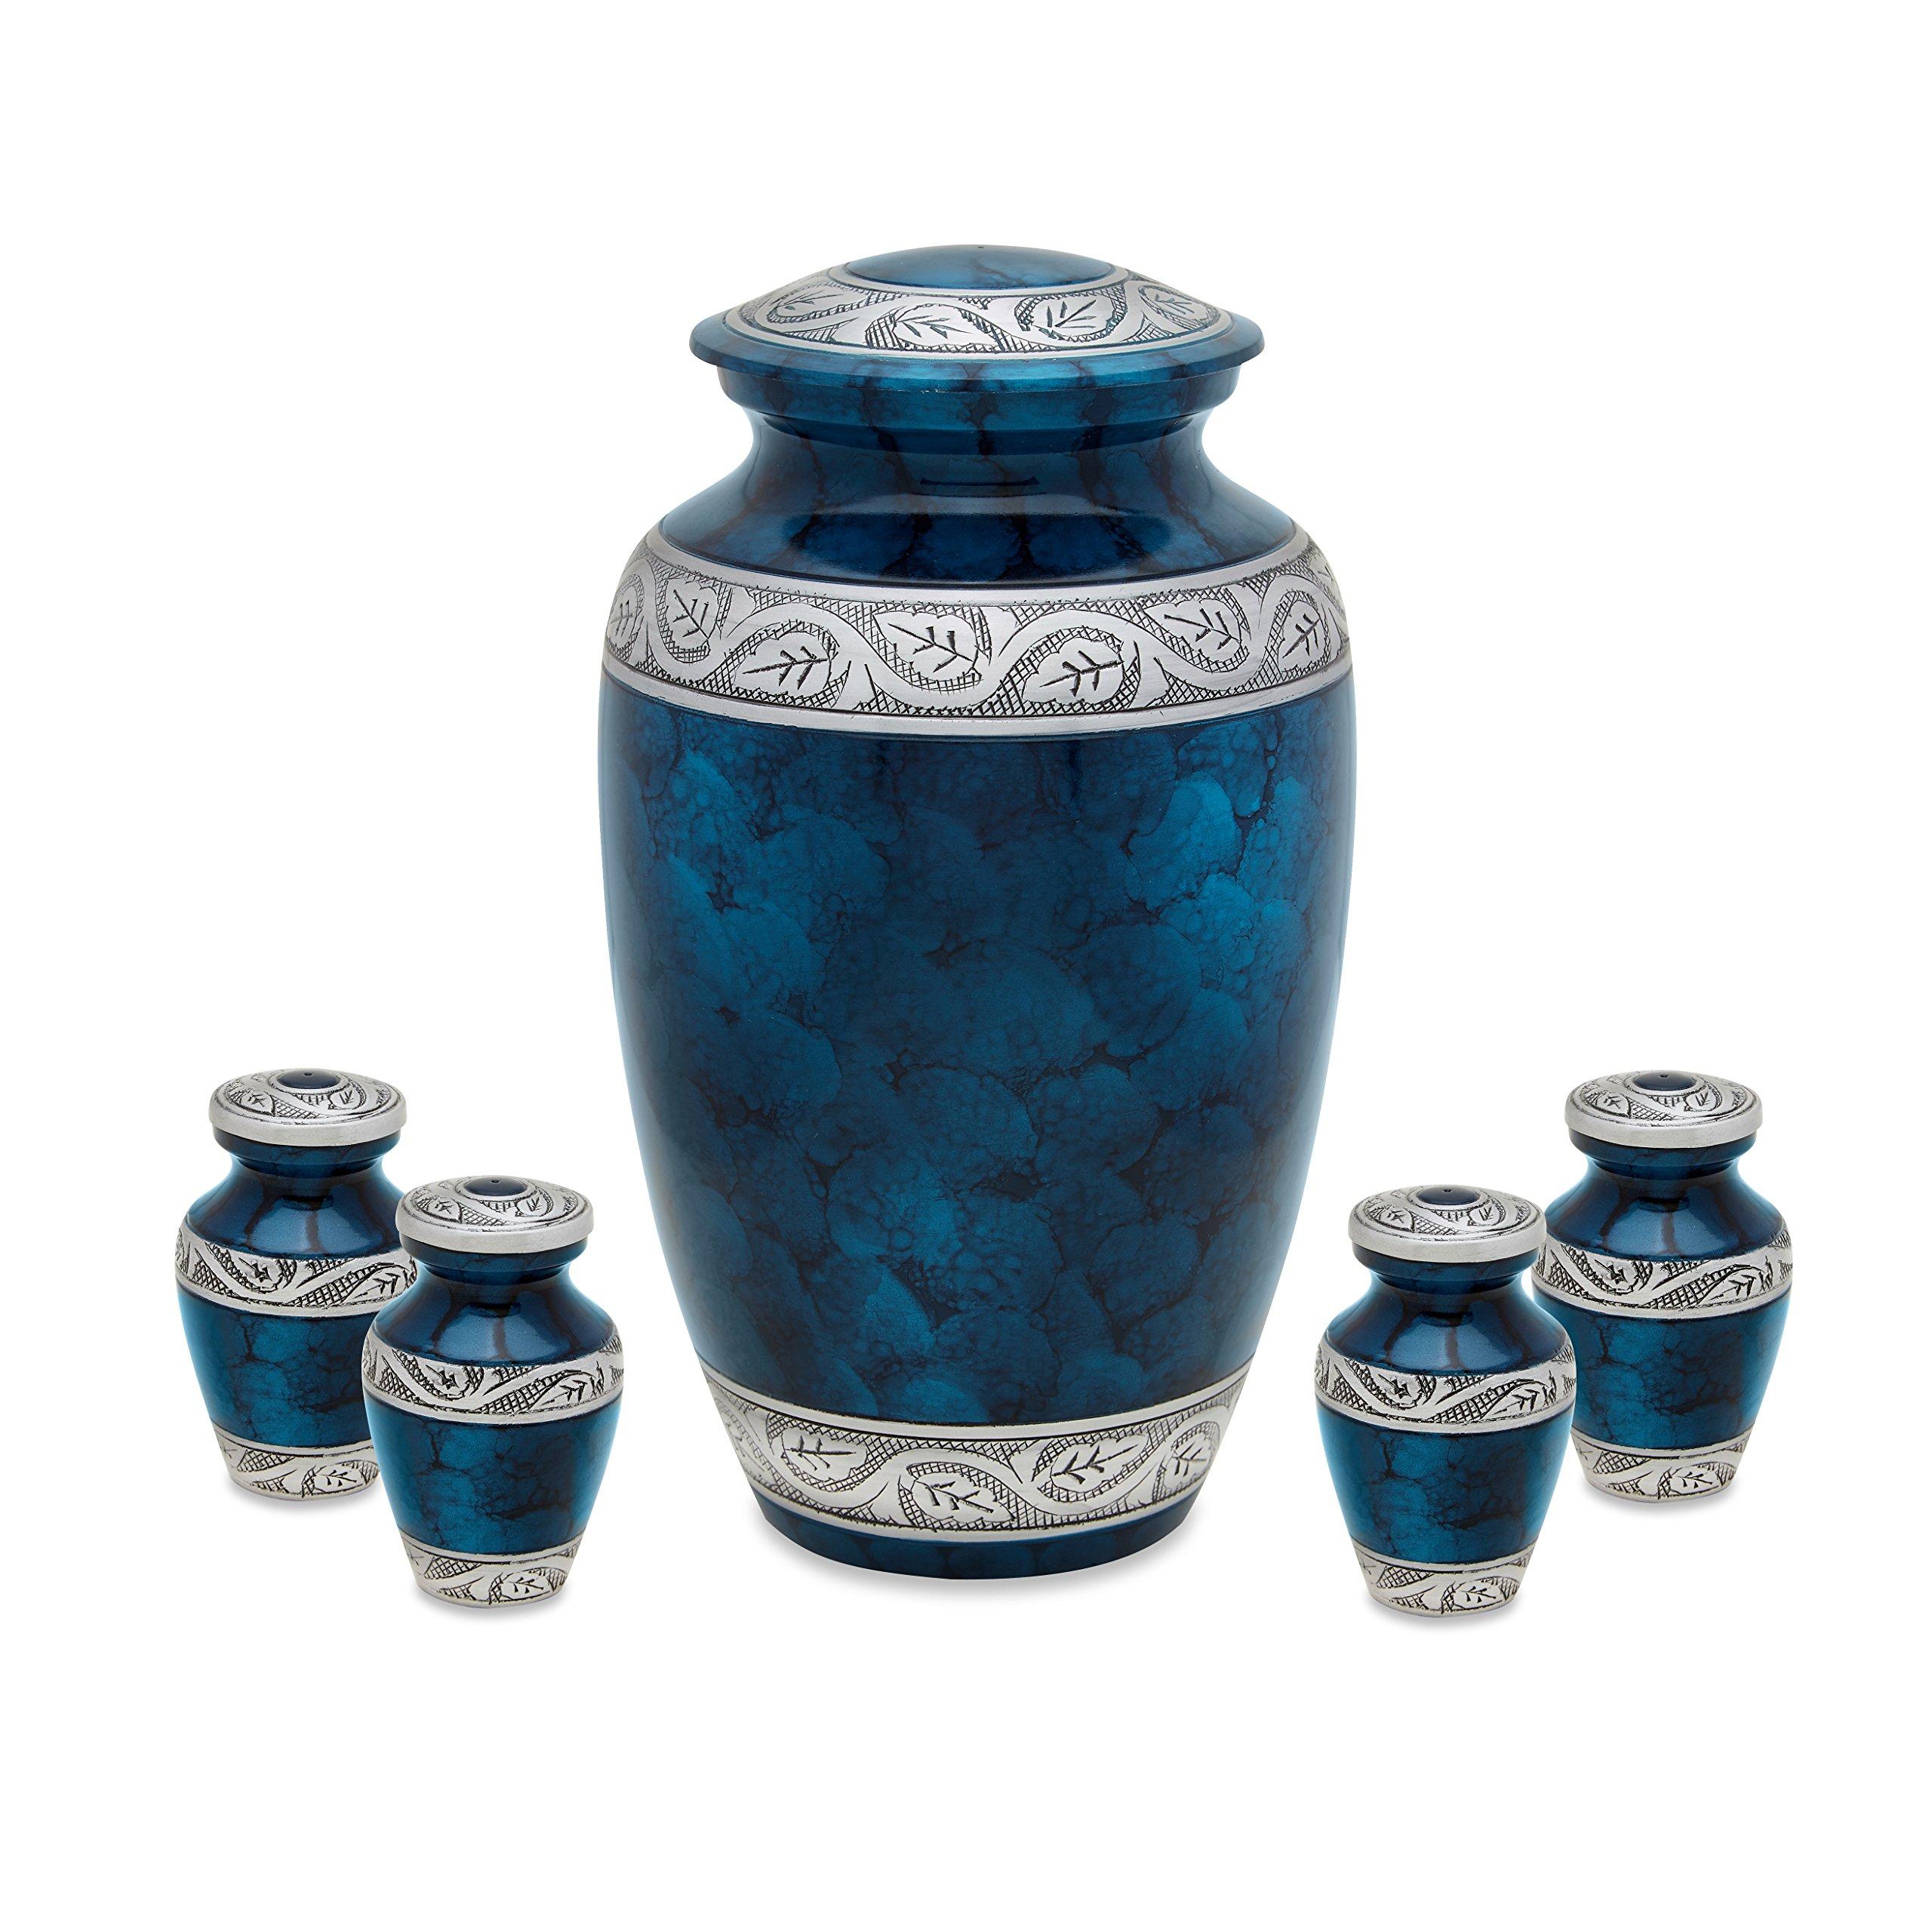 Middleton Blue Adult Urn with 4 matching keepsake token urns by UrnsDirect2U